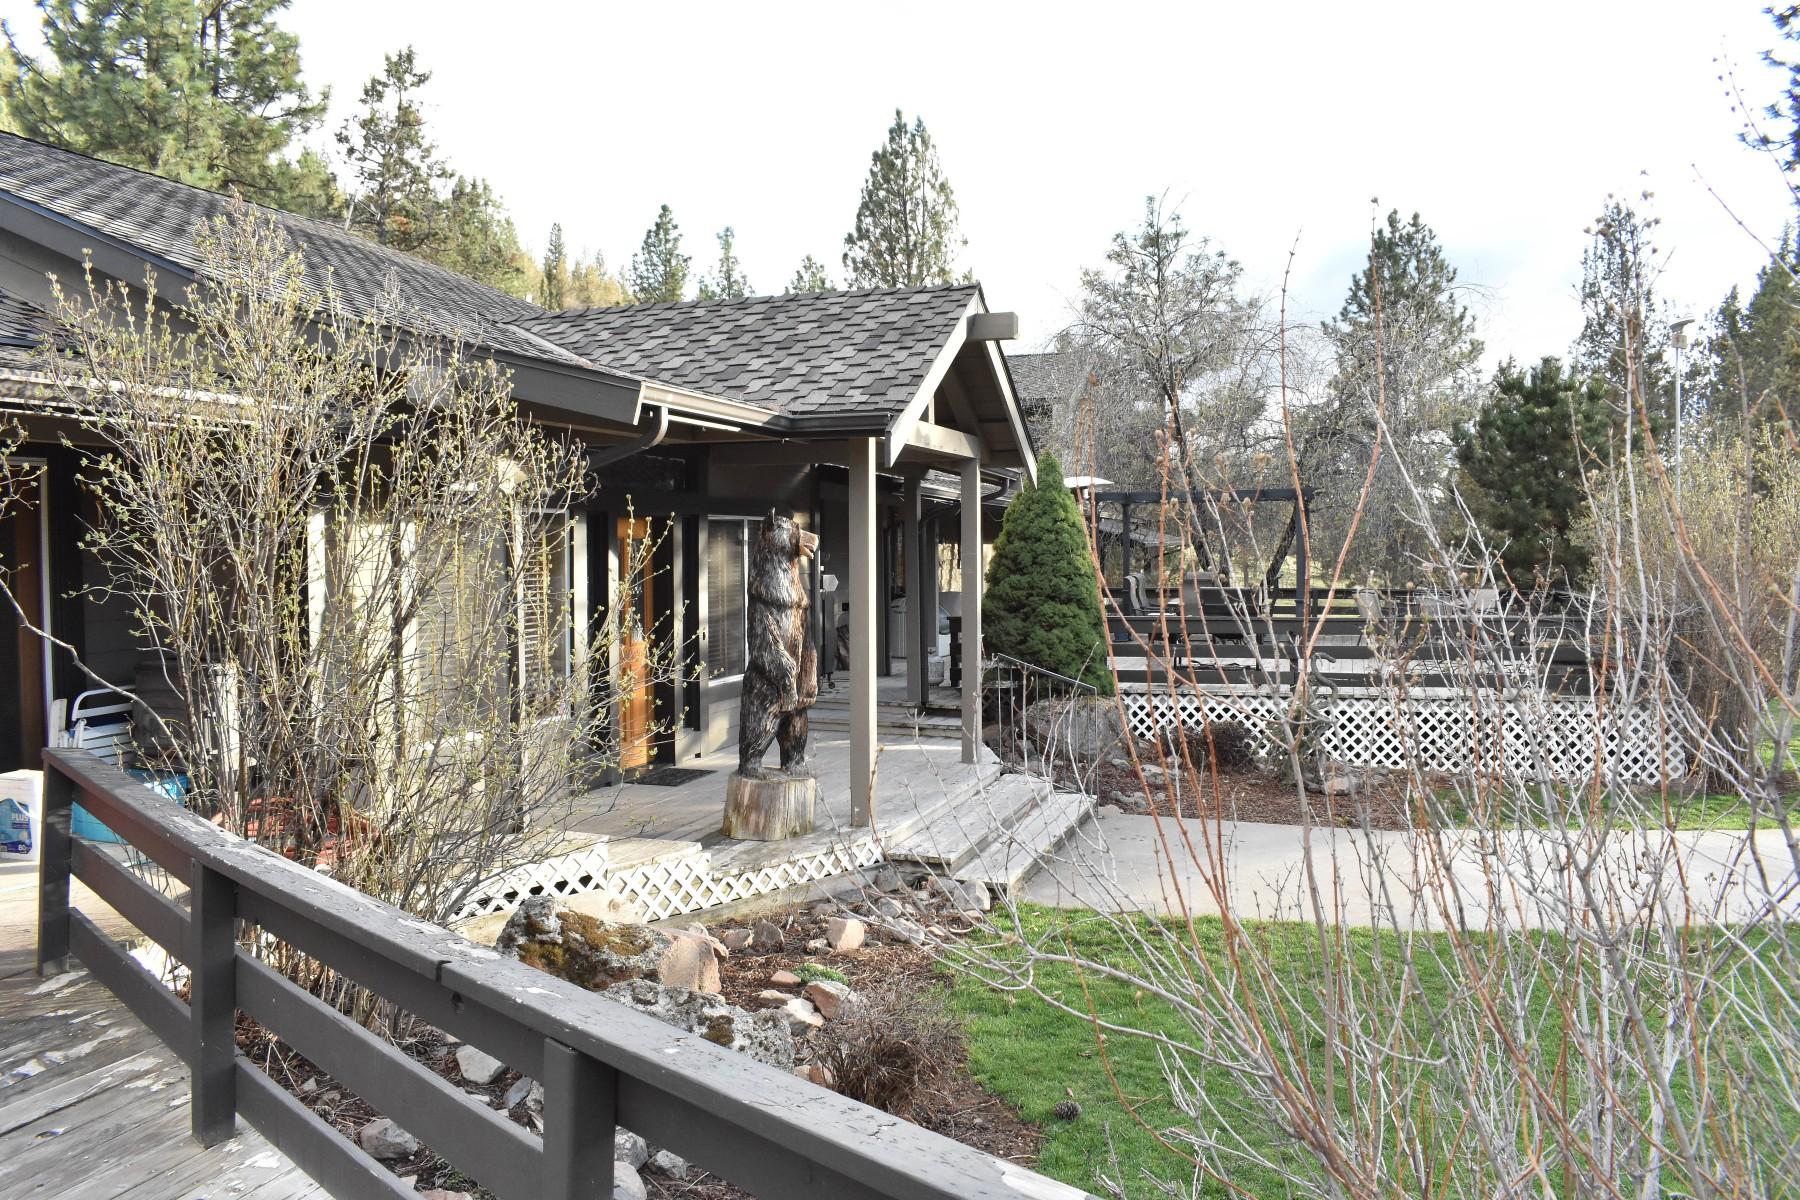 Other Residential Homes για την Πώληση στο 3790 NE McKay Creek Road Prineville, OR 97754 Prineville, Ορεγκον 97754 Ηνωμένες Πολιτείες